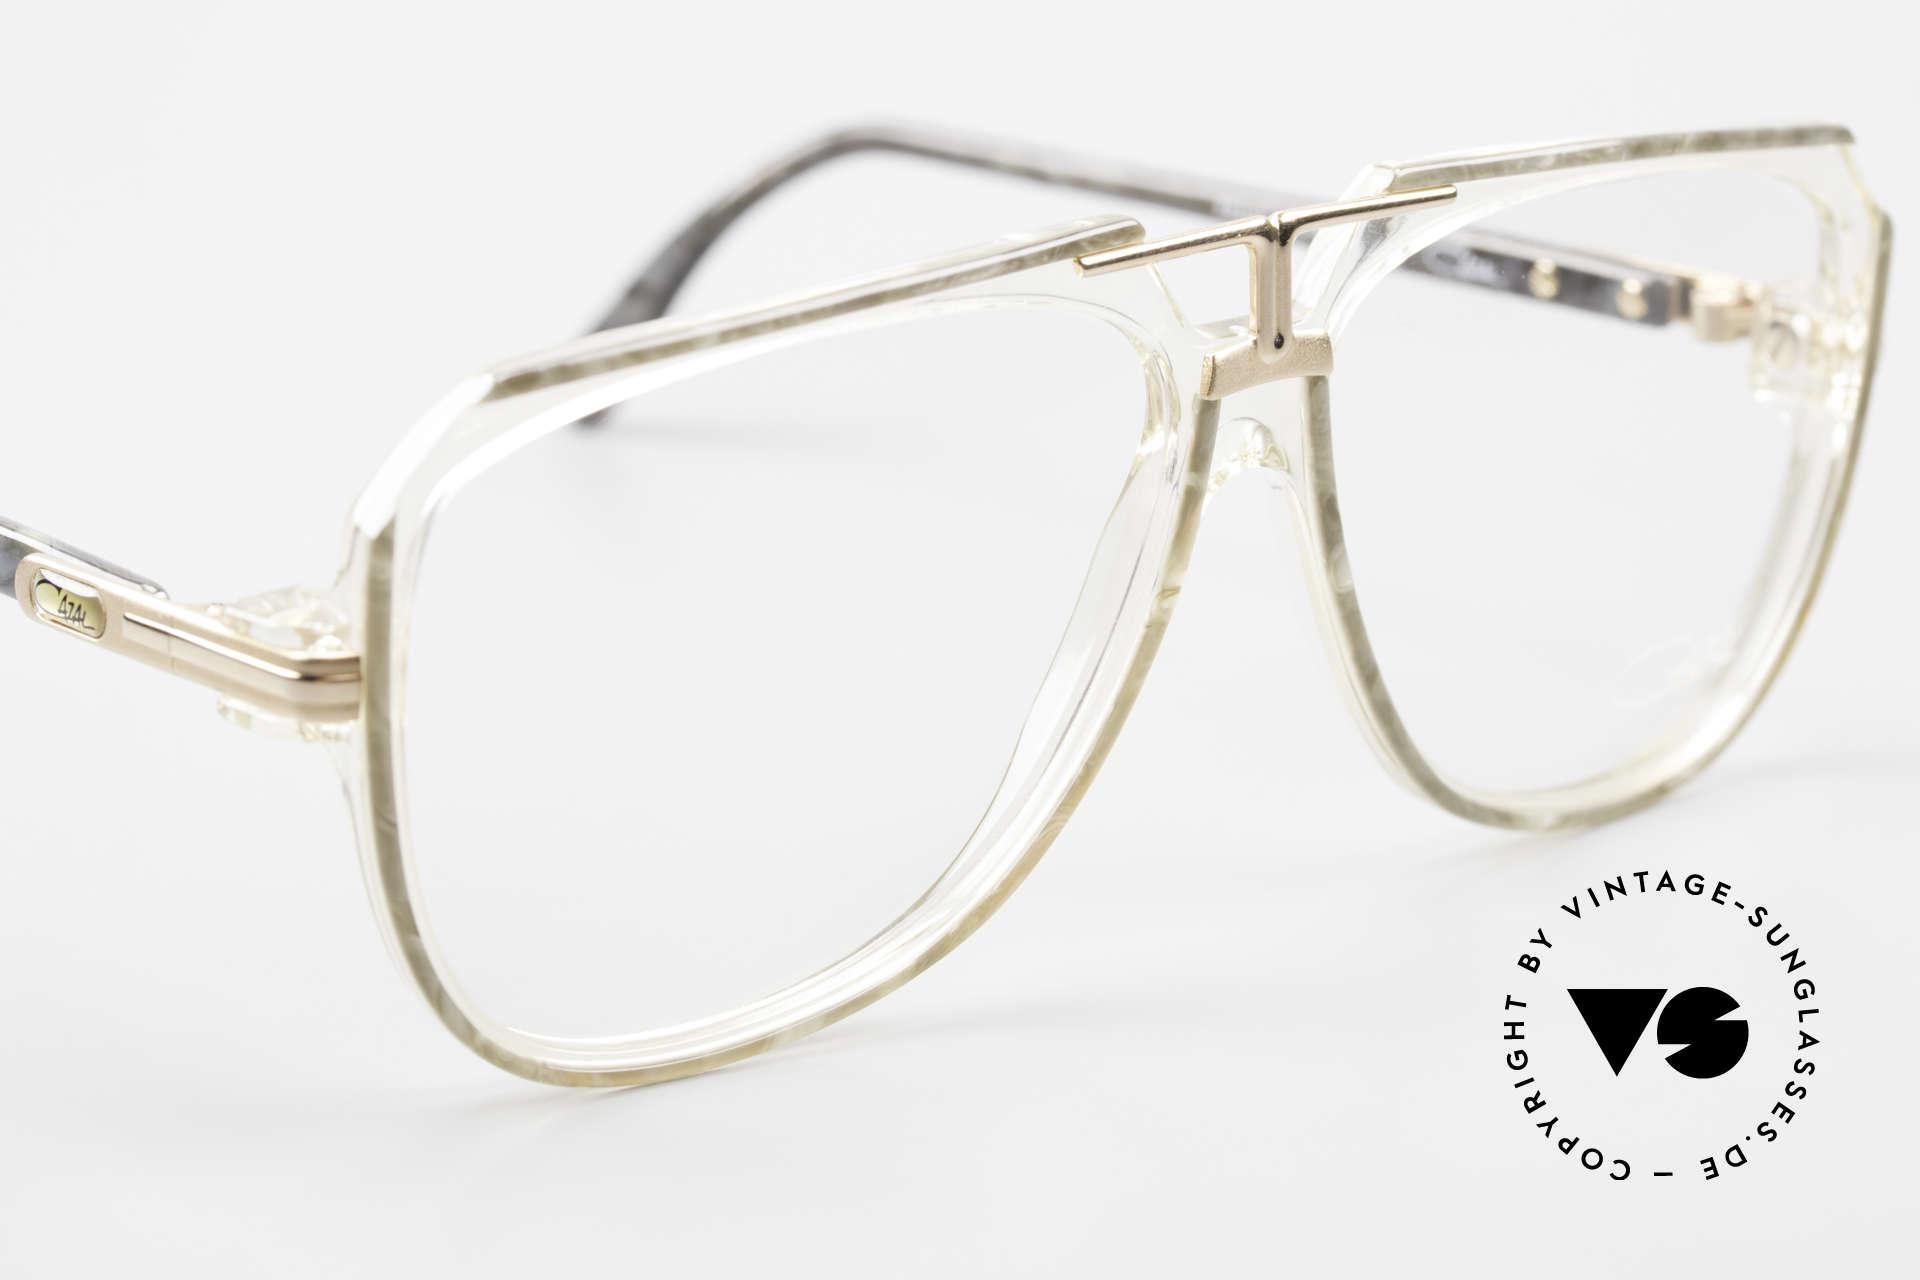 Cazal 636 Old West Germany 80's Cazal, NO RETRO eyewear, but a rare ORIGINAL, Made for Men